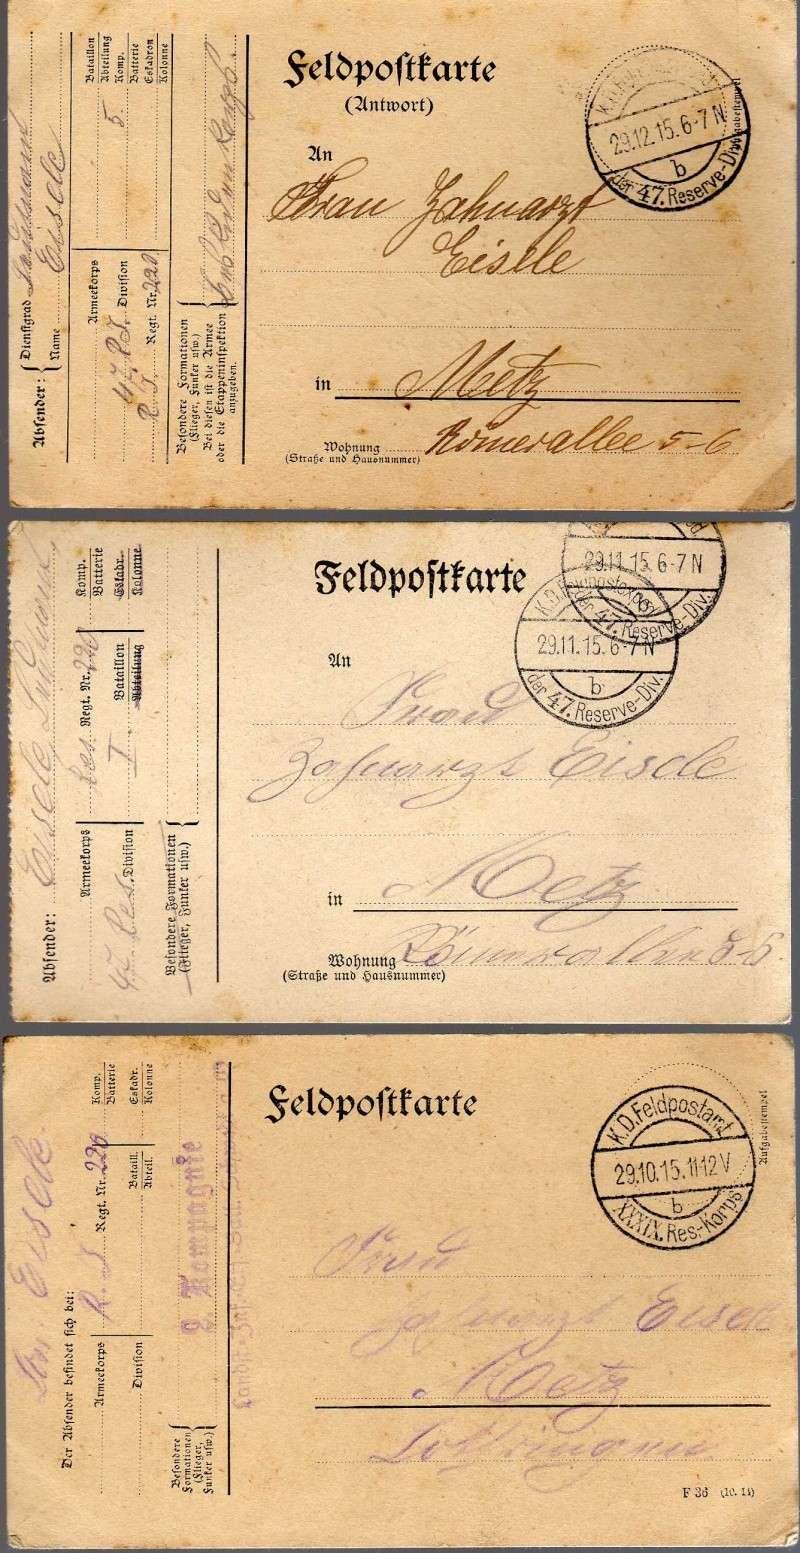 postkarte ou correspondances militaires allemandes